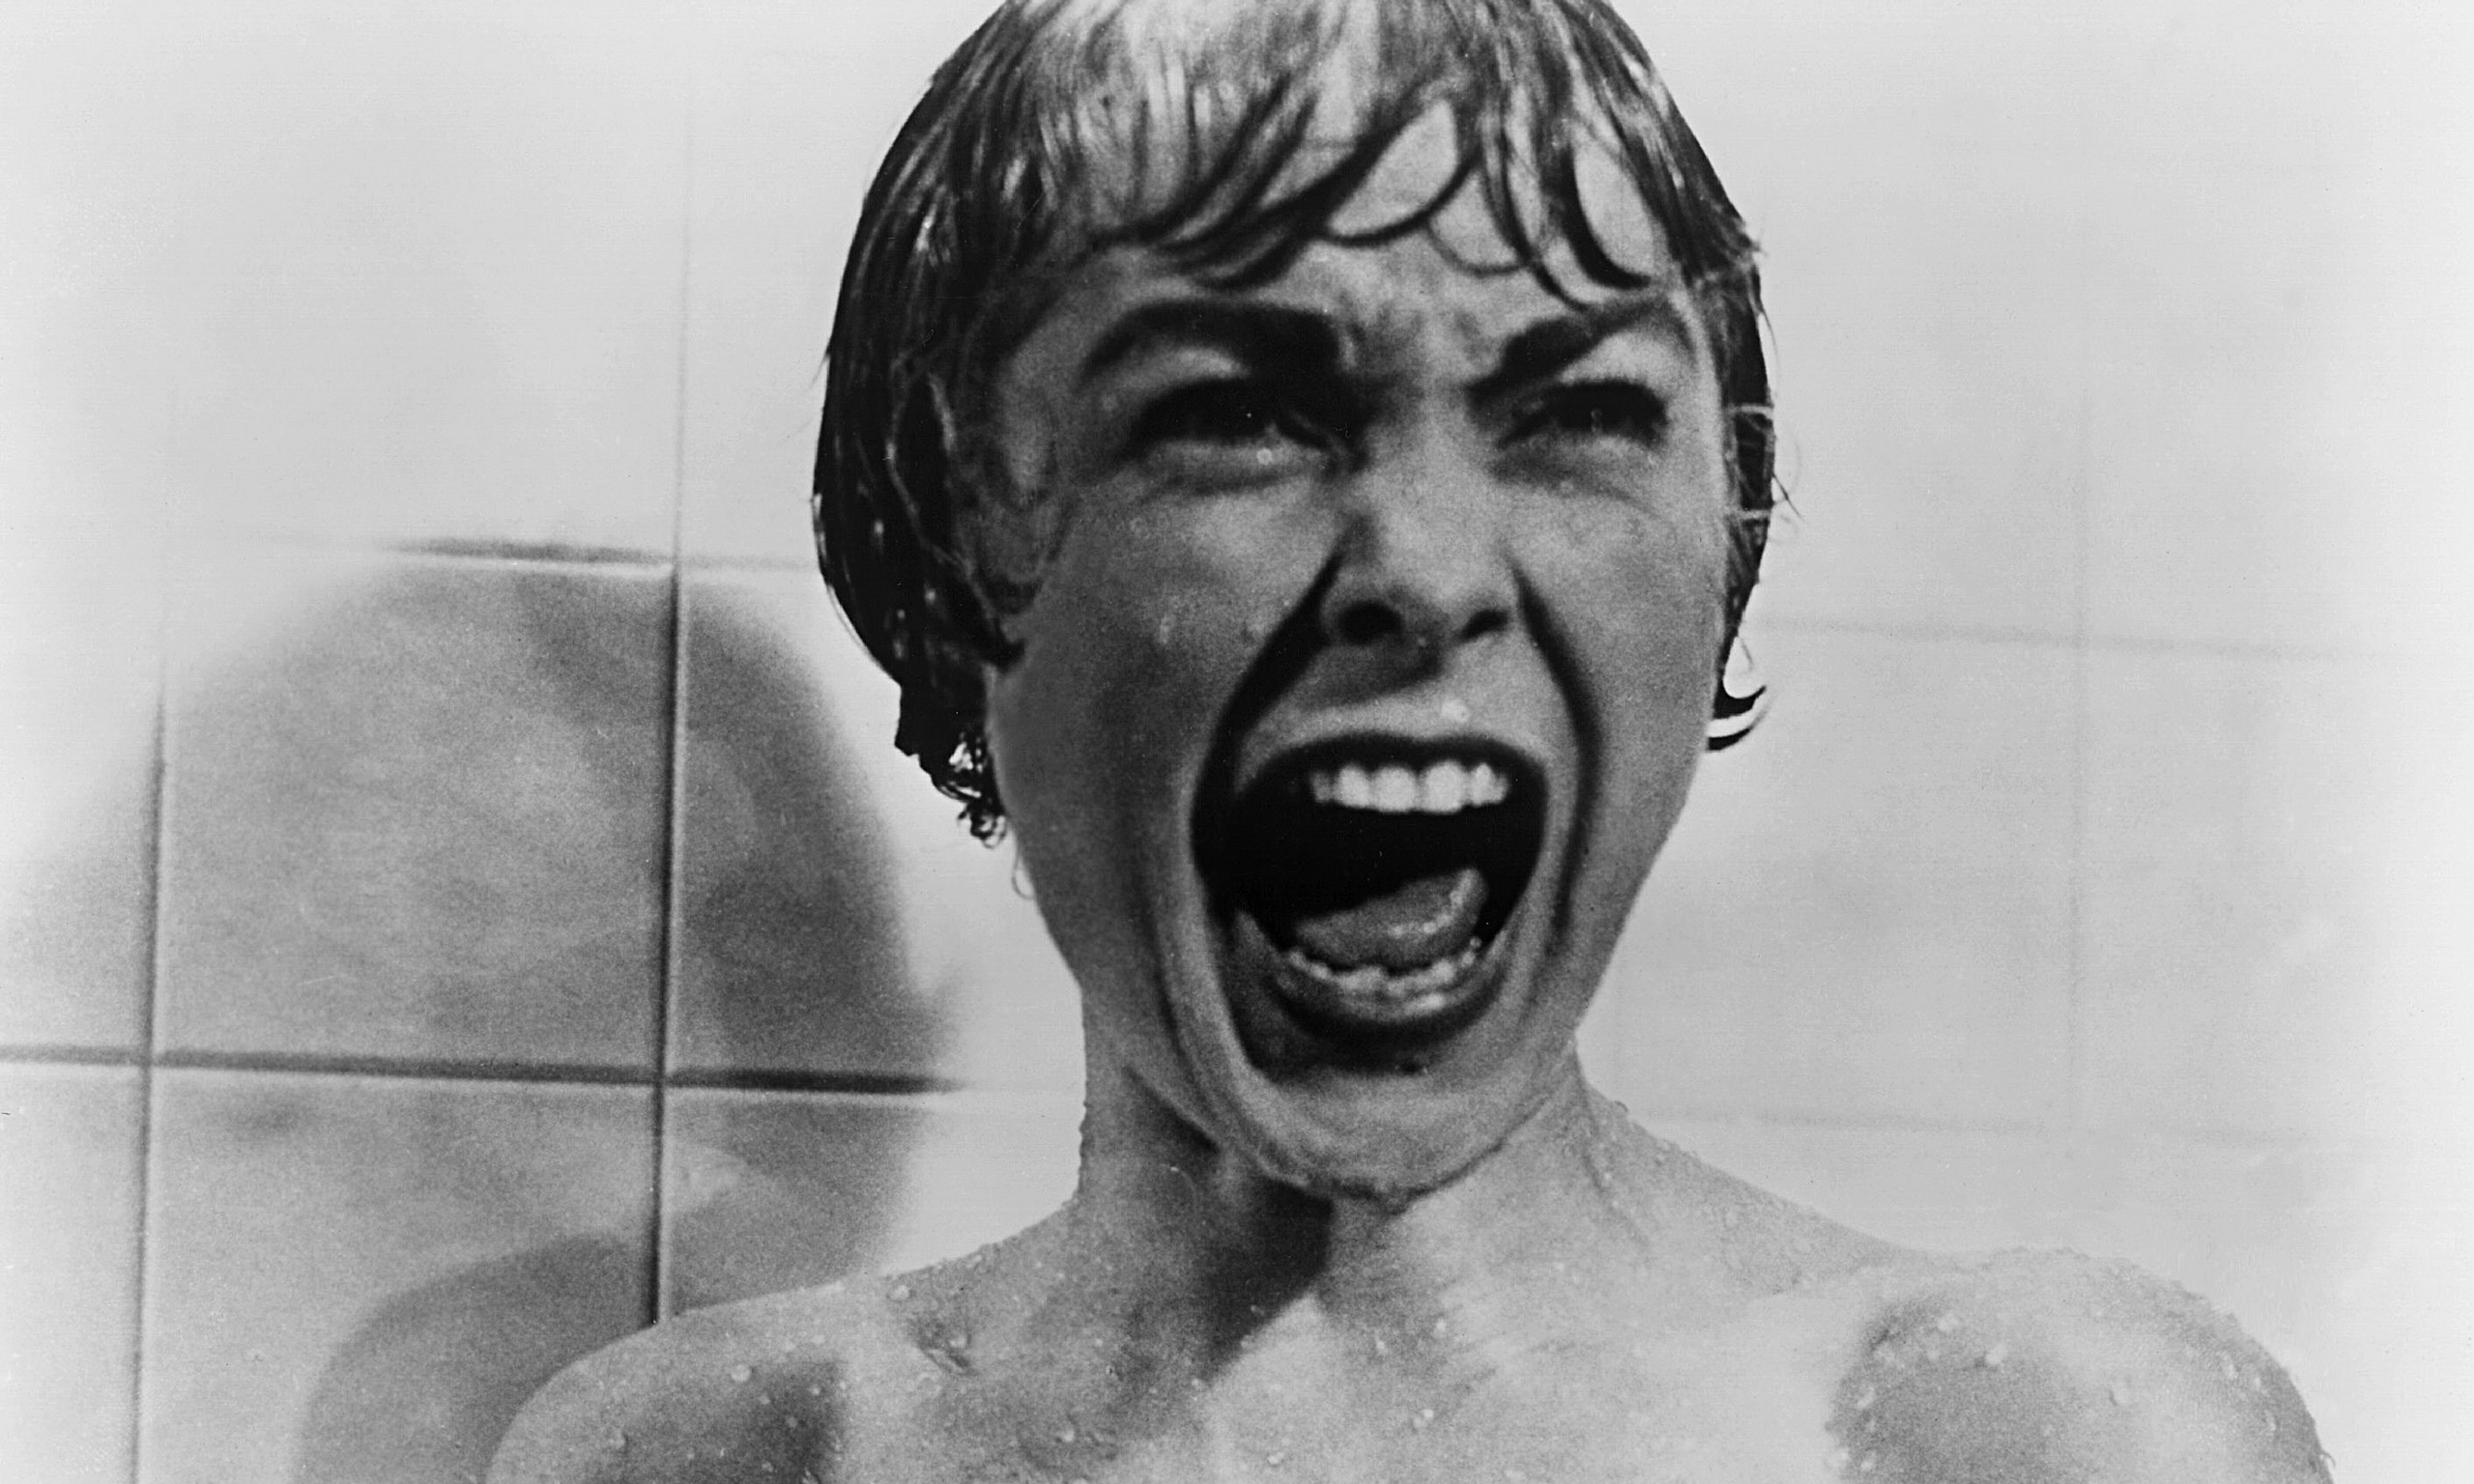 Janet-Leigh-in-Psycho-014.jpg